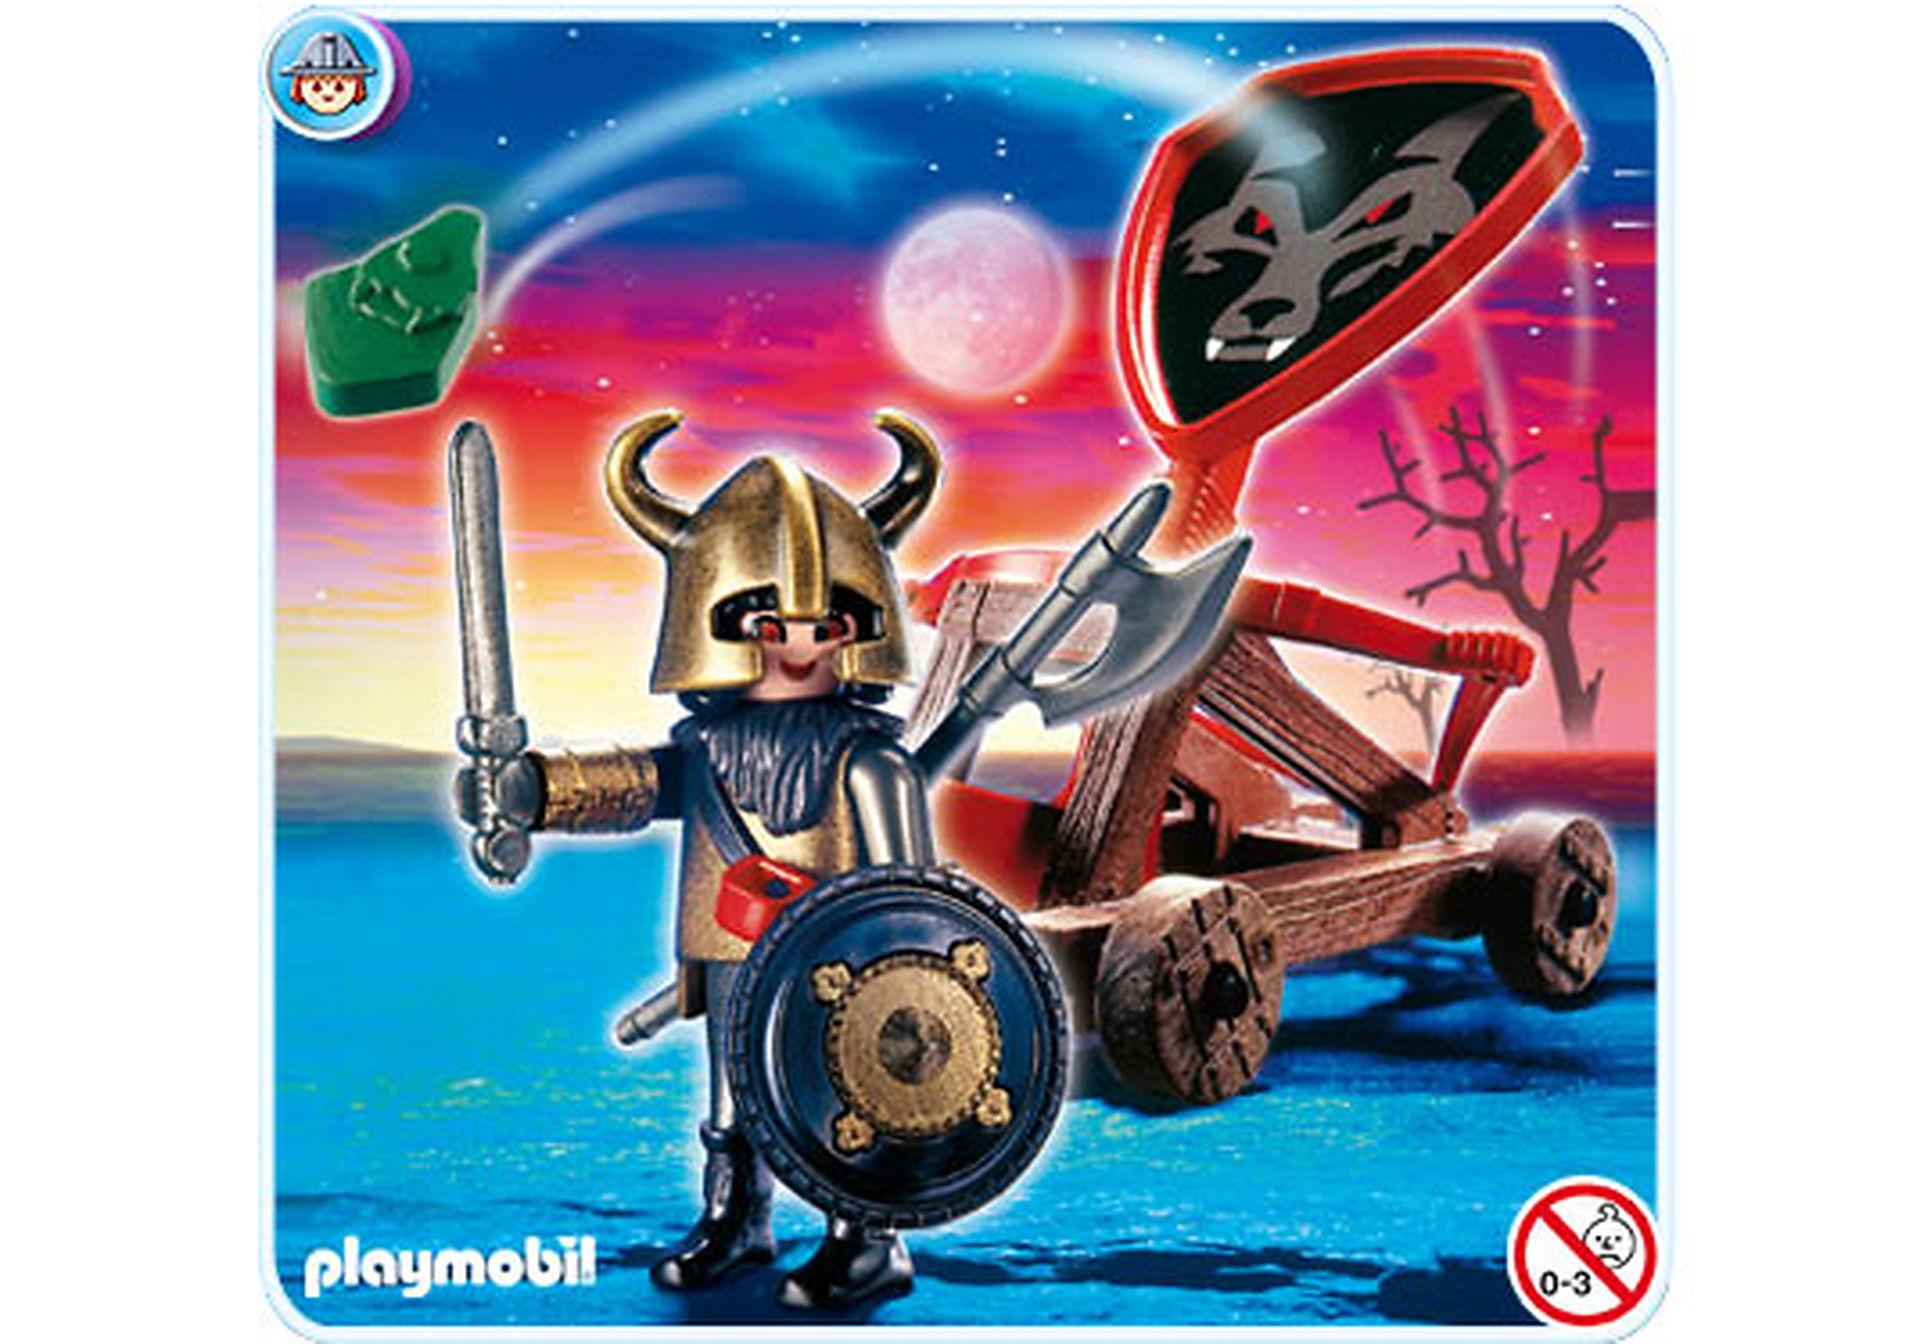 http://media.playmobil.com/i/playmobil/4812-A_product_detail/Katapult für Wolfsgespann